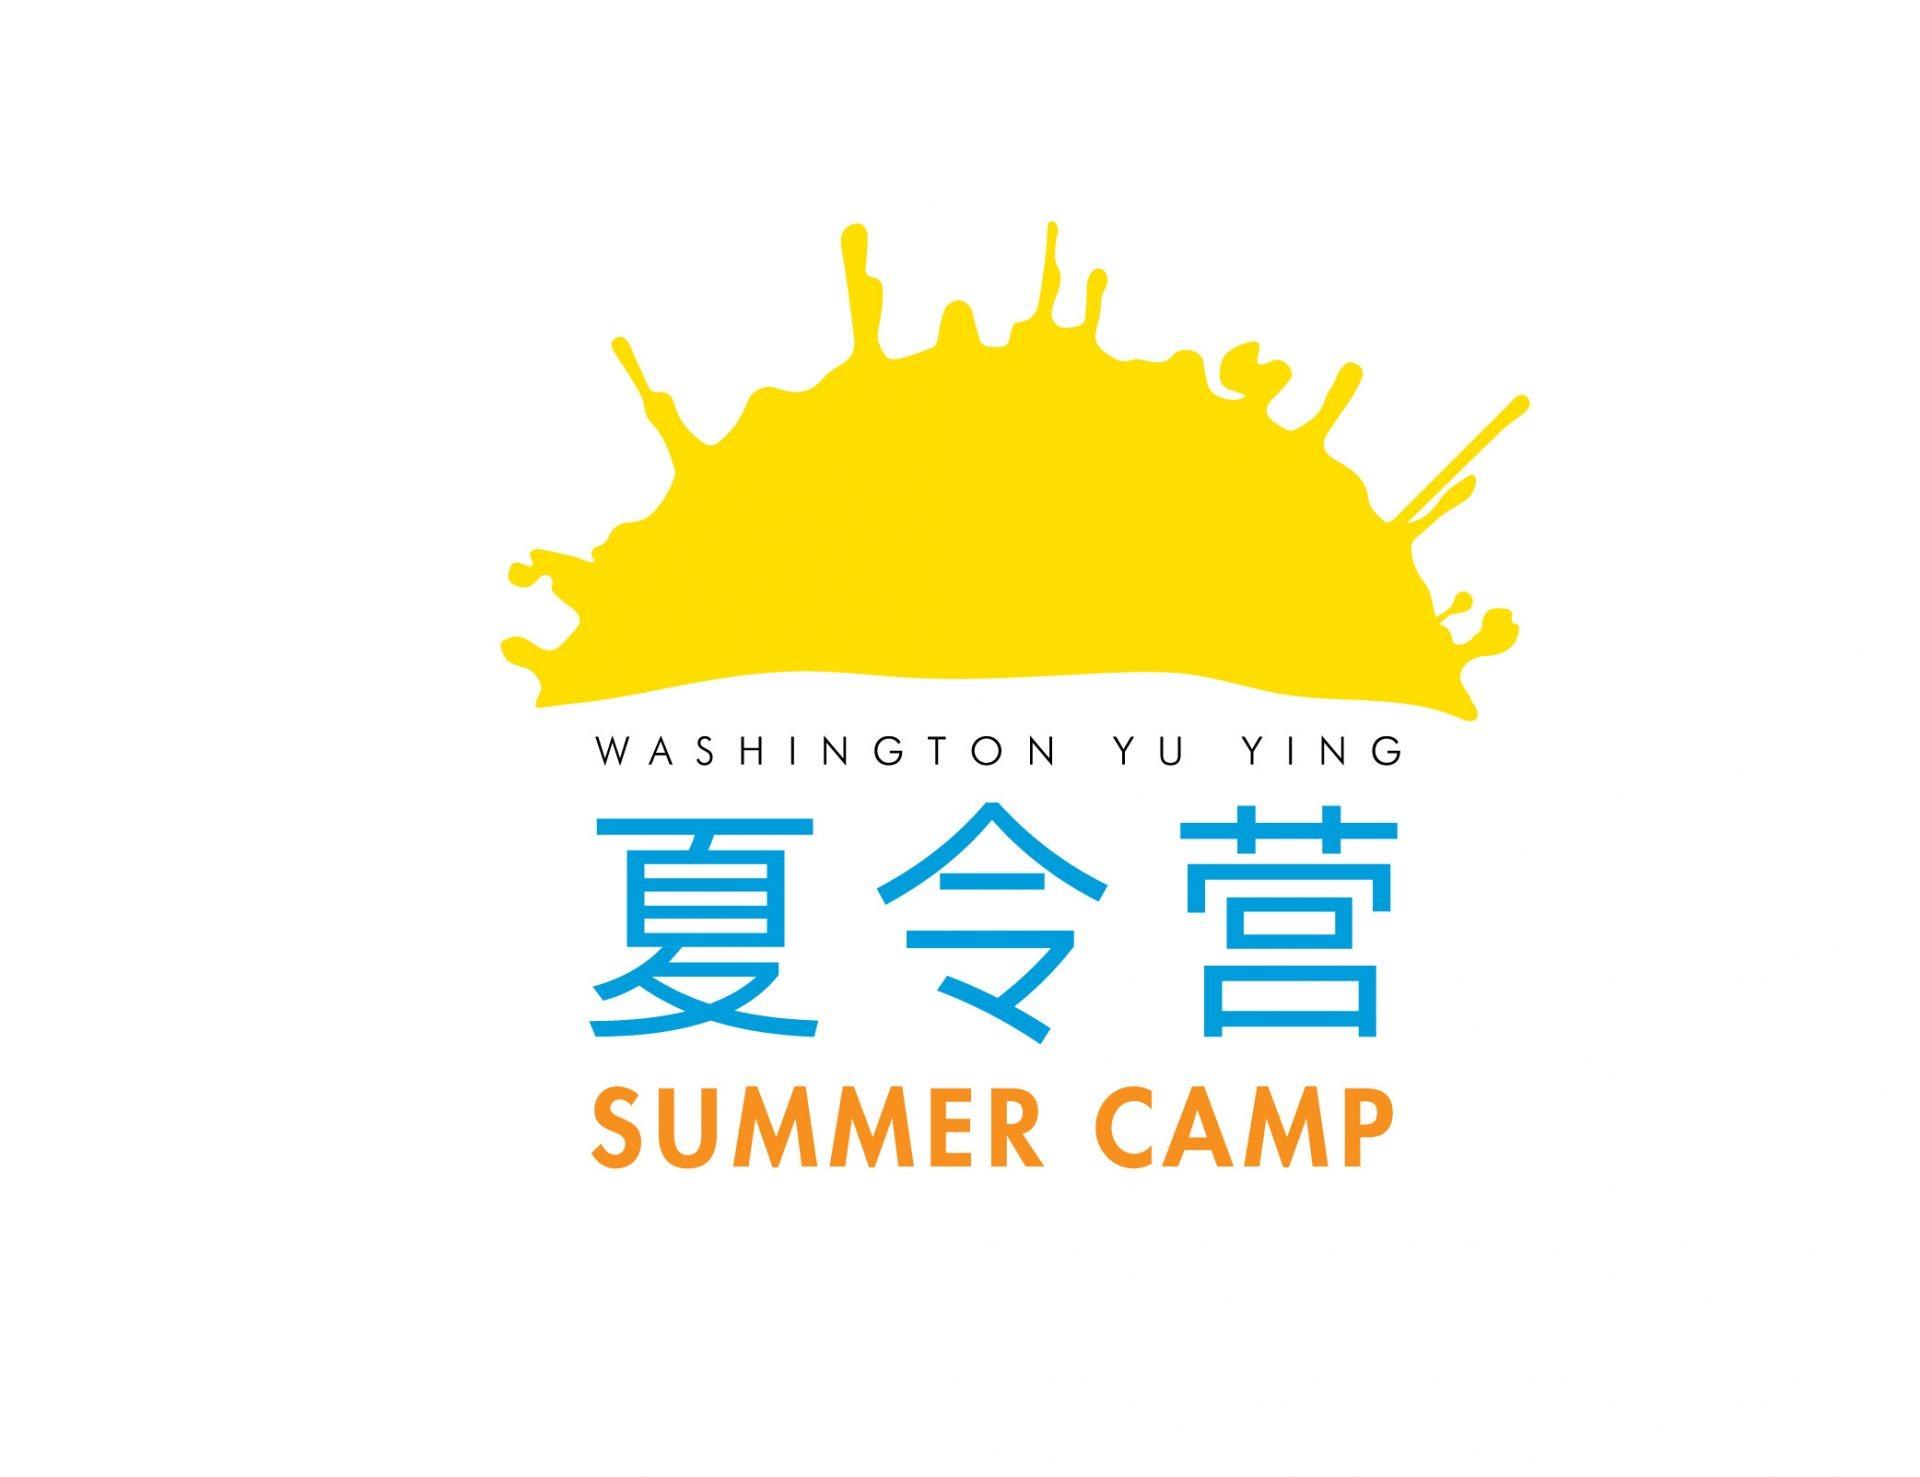 Washington DC Yu Ying Summer Camp Logo design